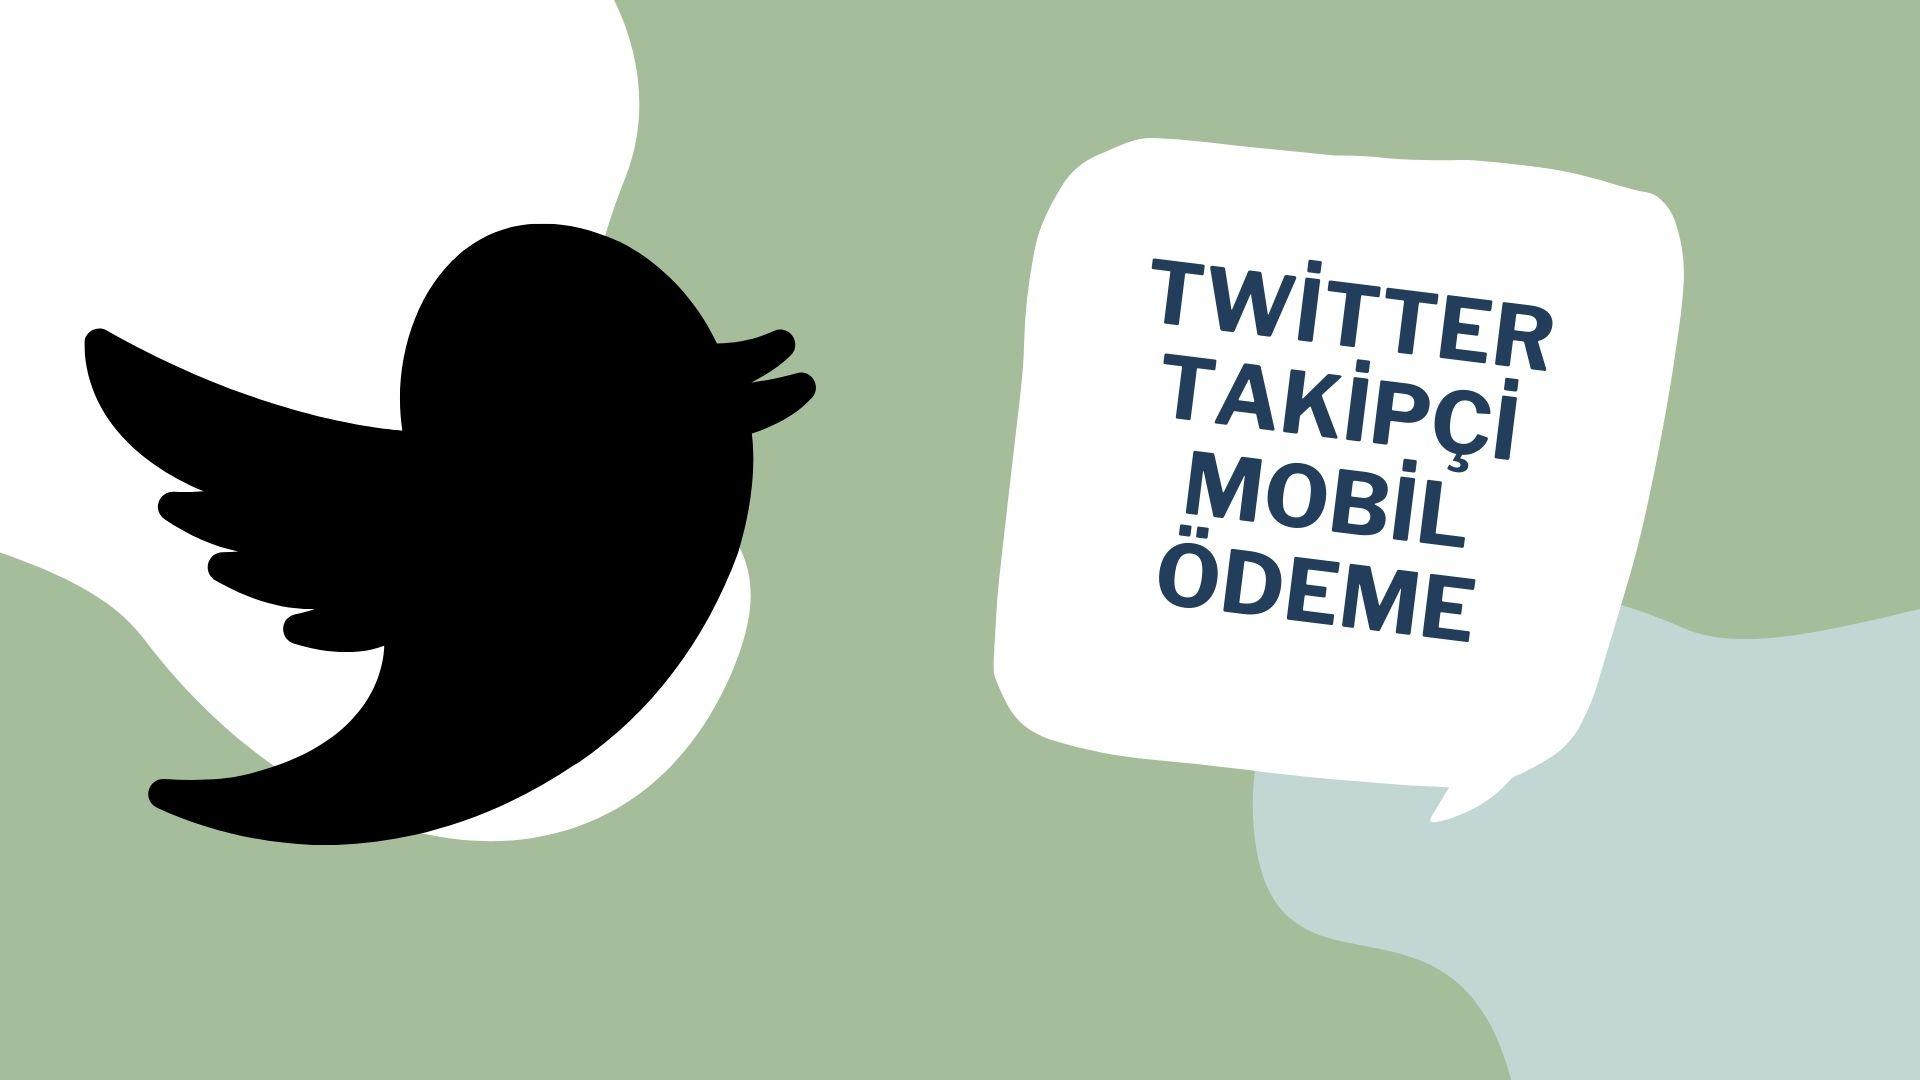 Twitter Takipçi Mobil Ödeme